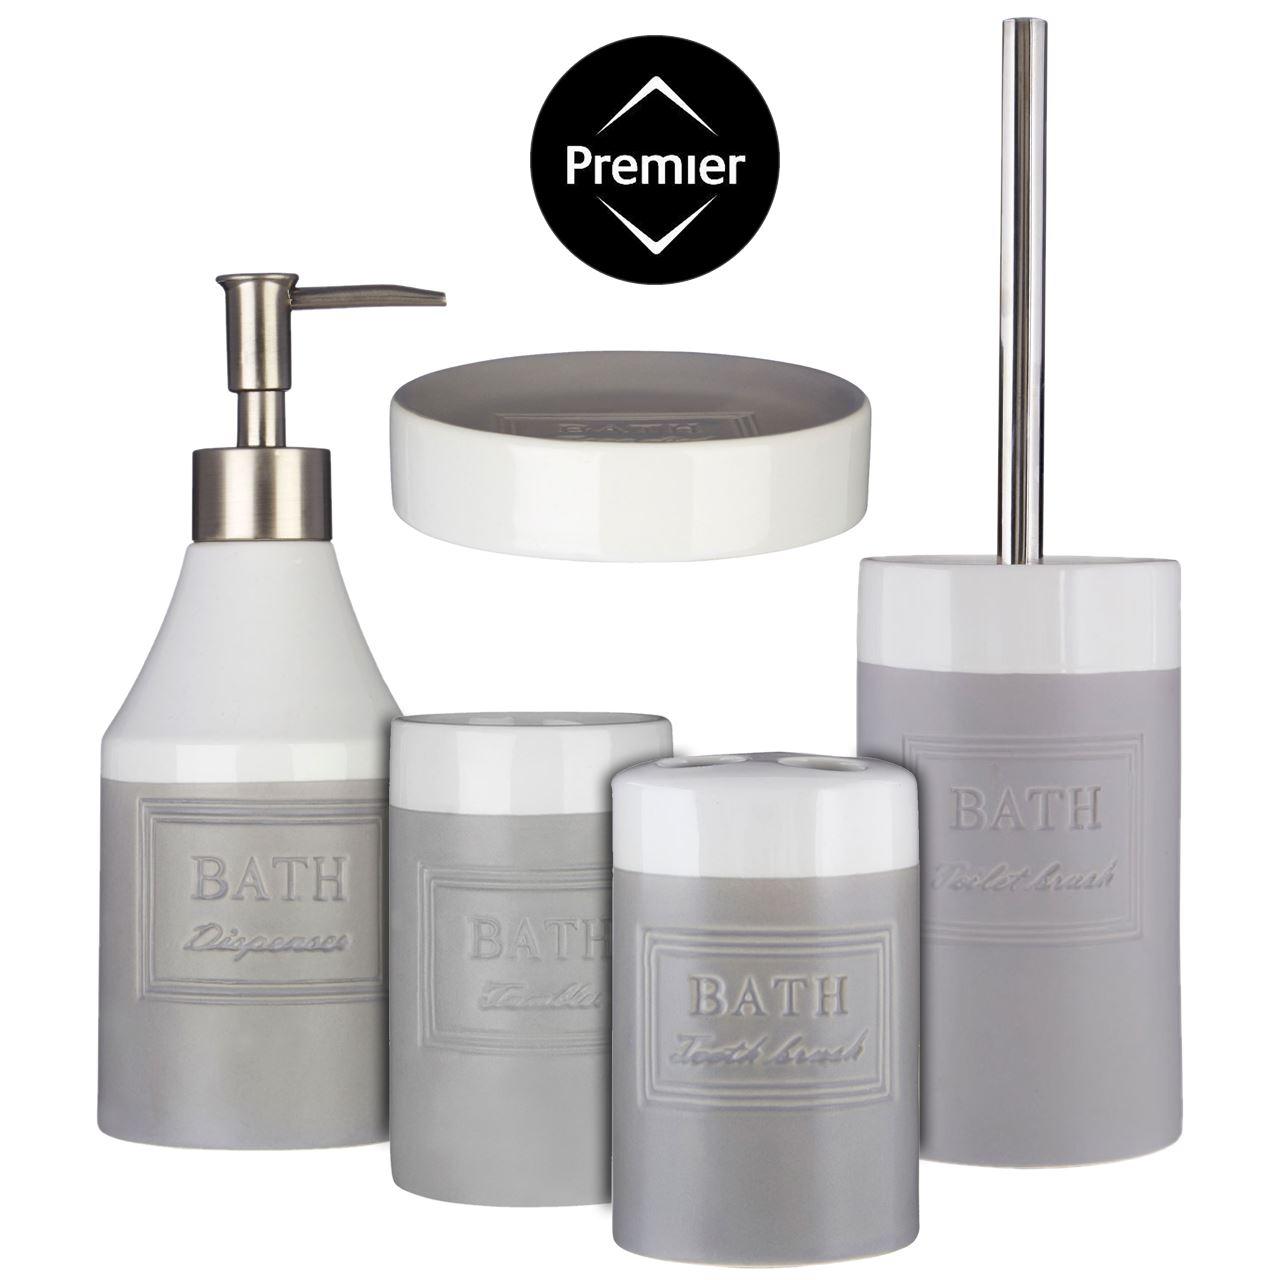 5 Pcs Bathroom Accessory Set Tumbler, Toothbrush Holder, Soap Dish ...